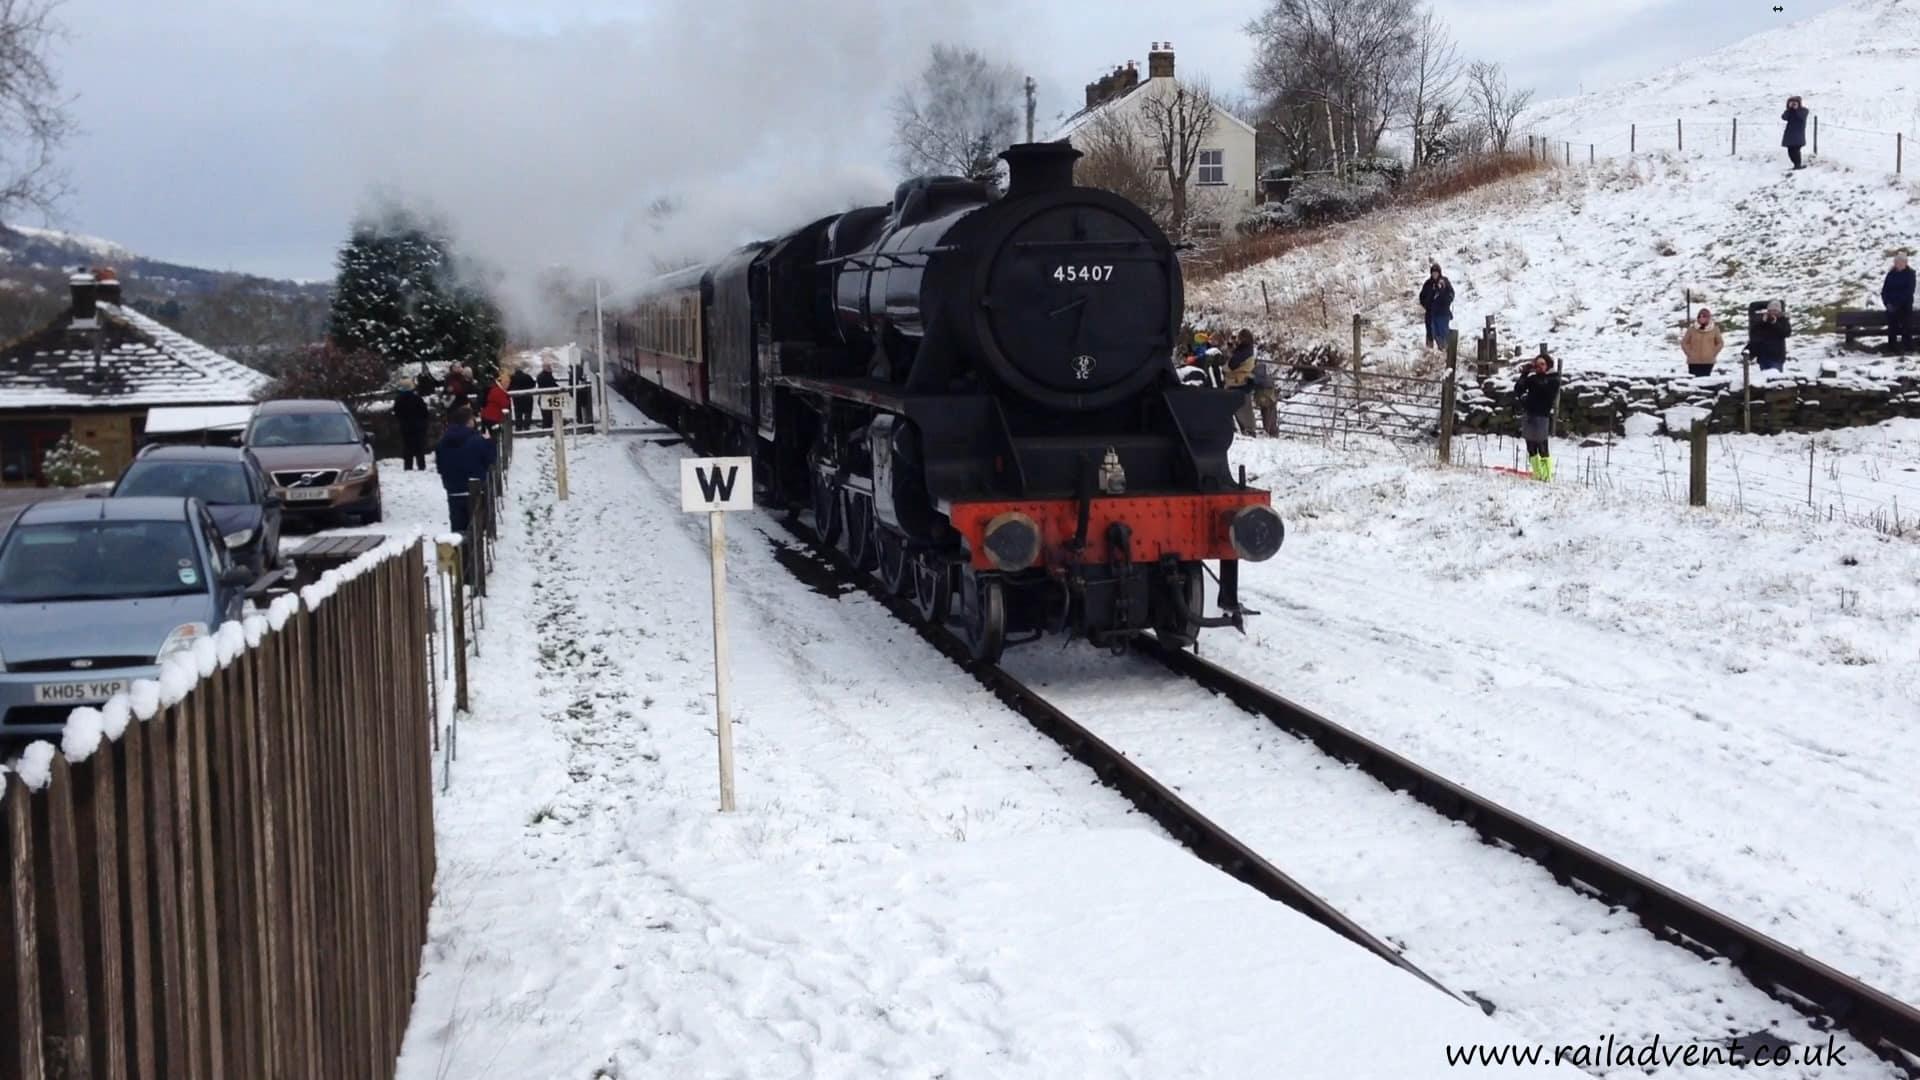 45407 arrives at Irwell Vale on the East Lancs Railway